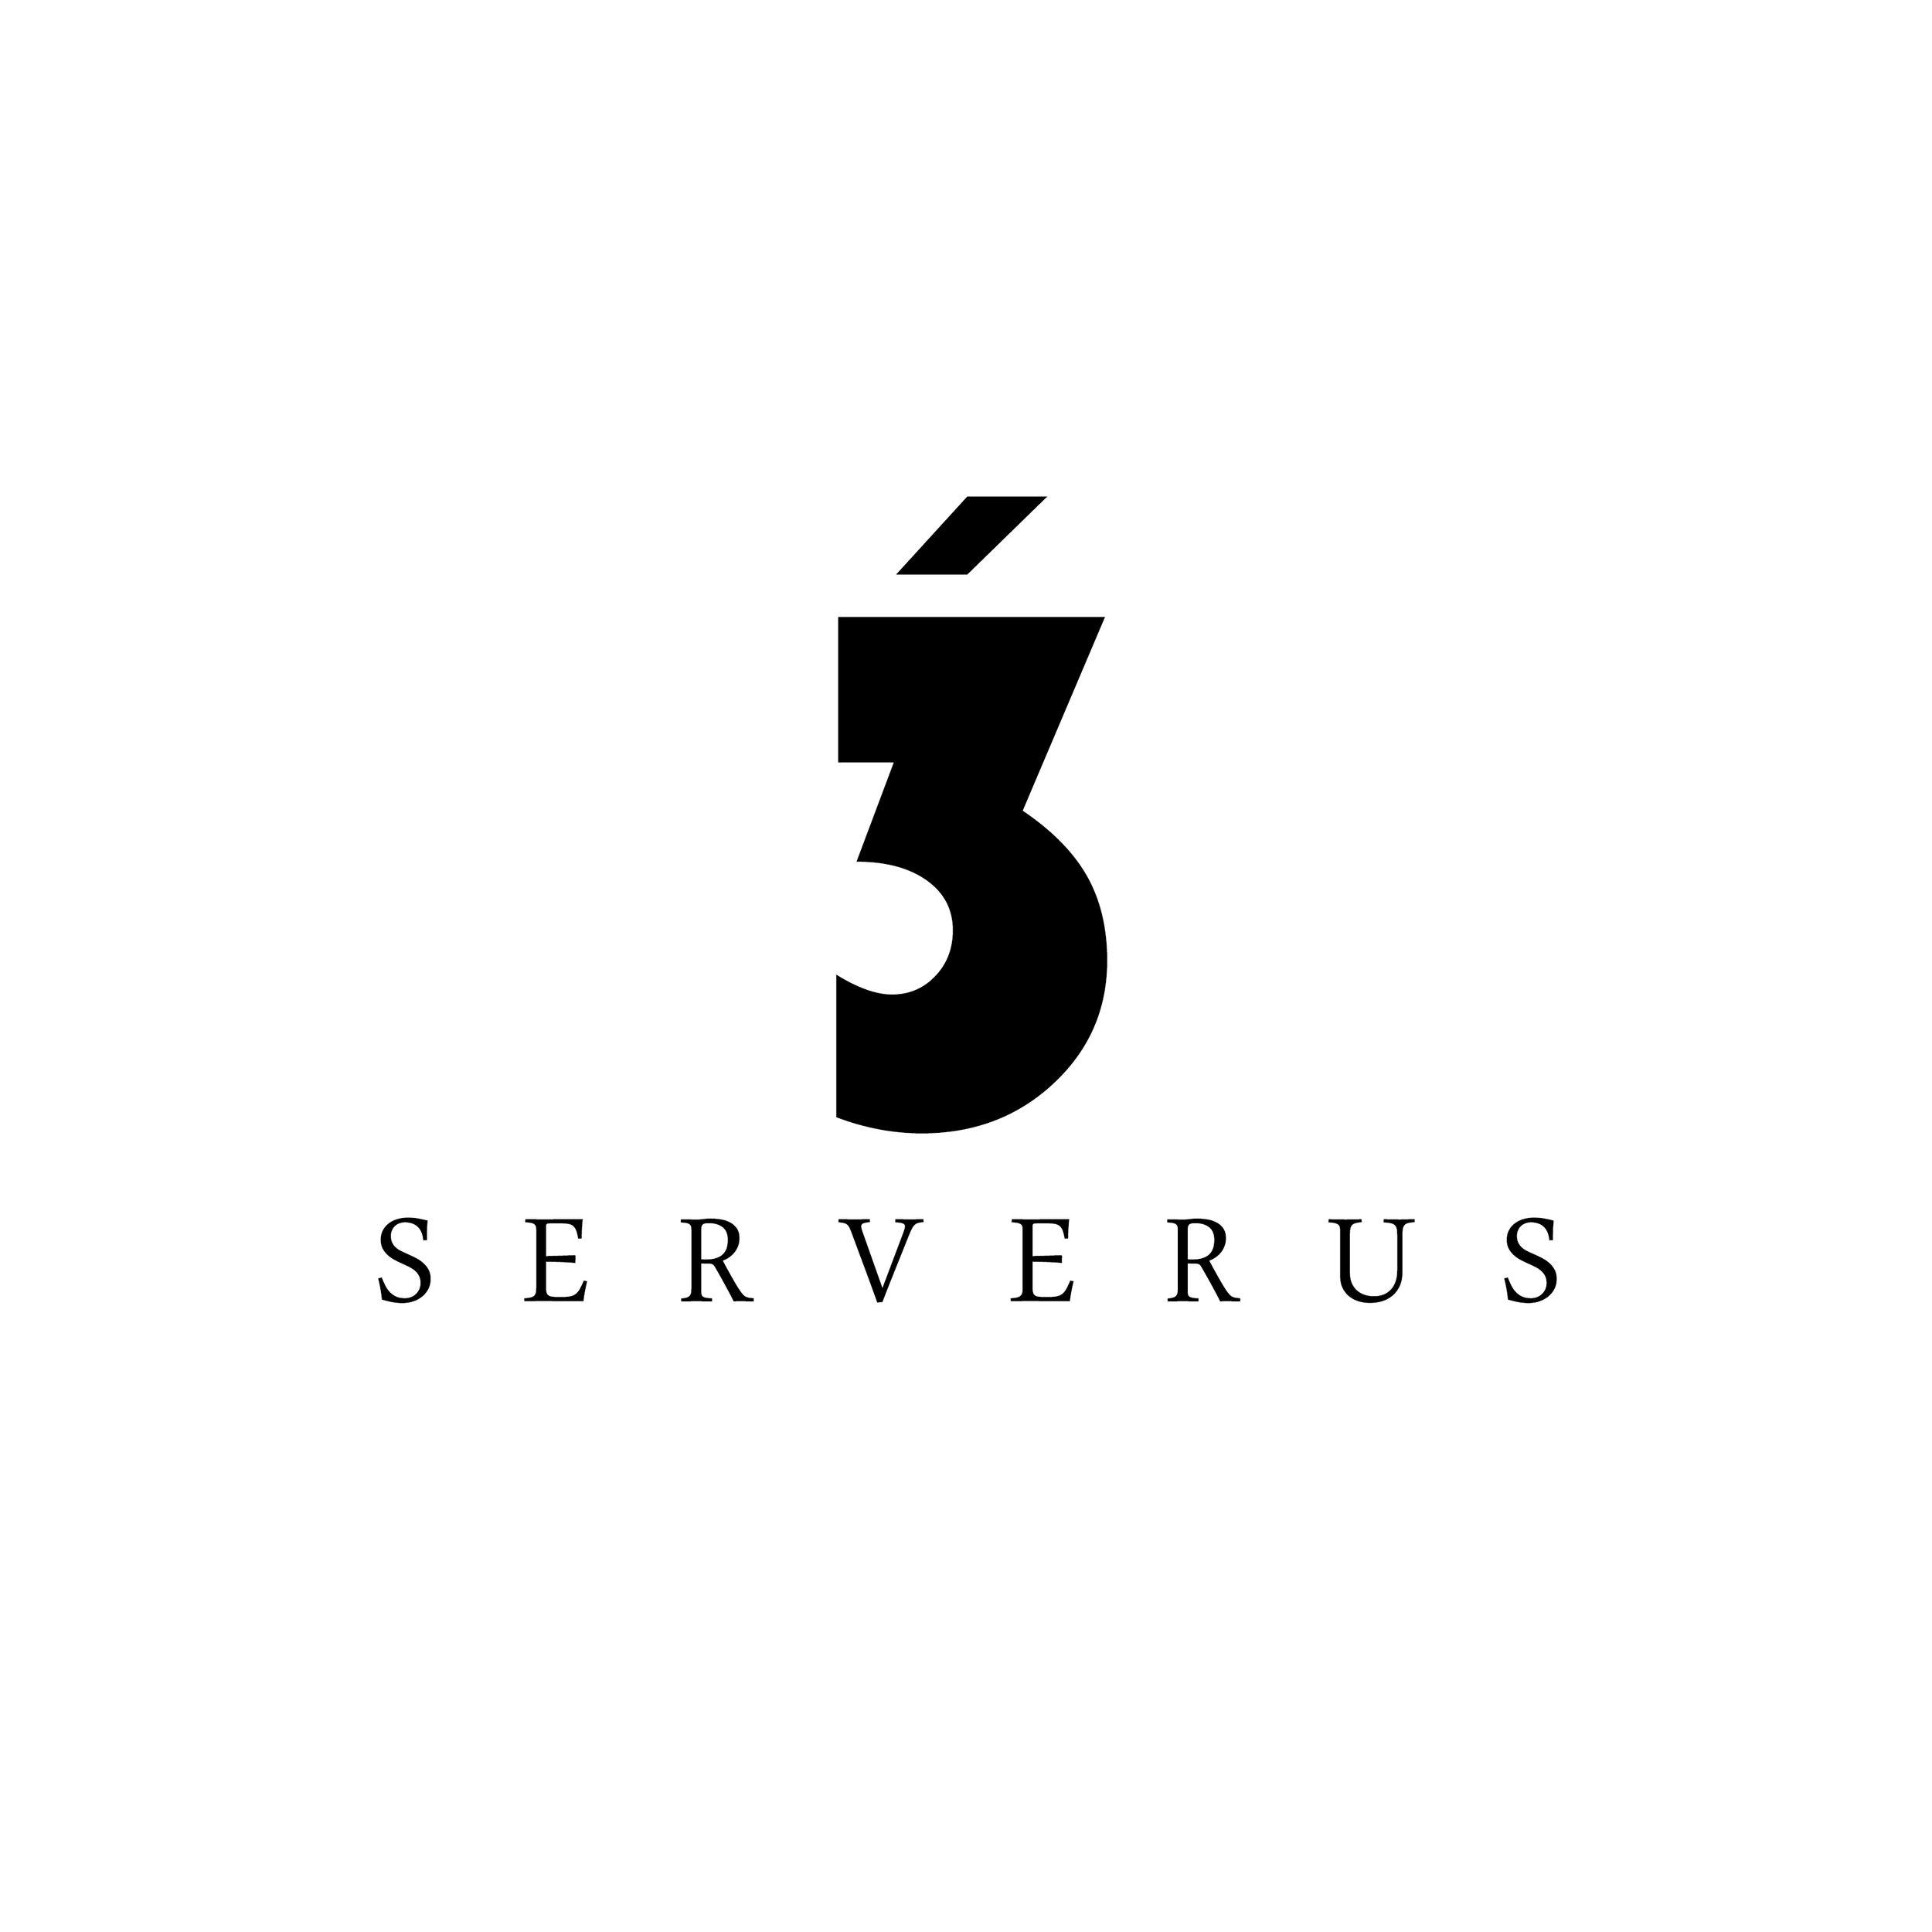 Serverus Logo with 3.jpg